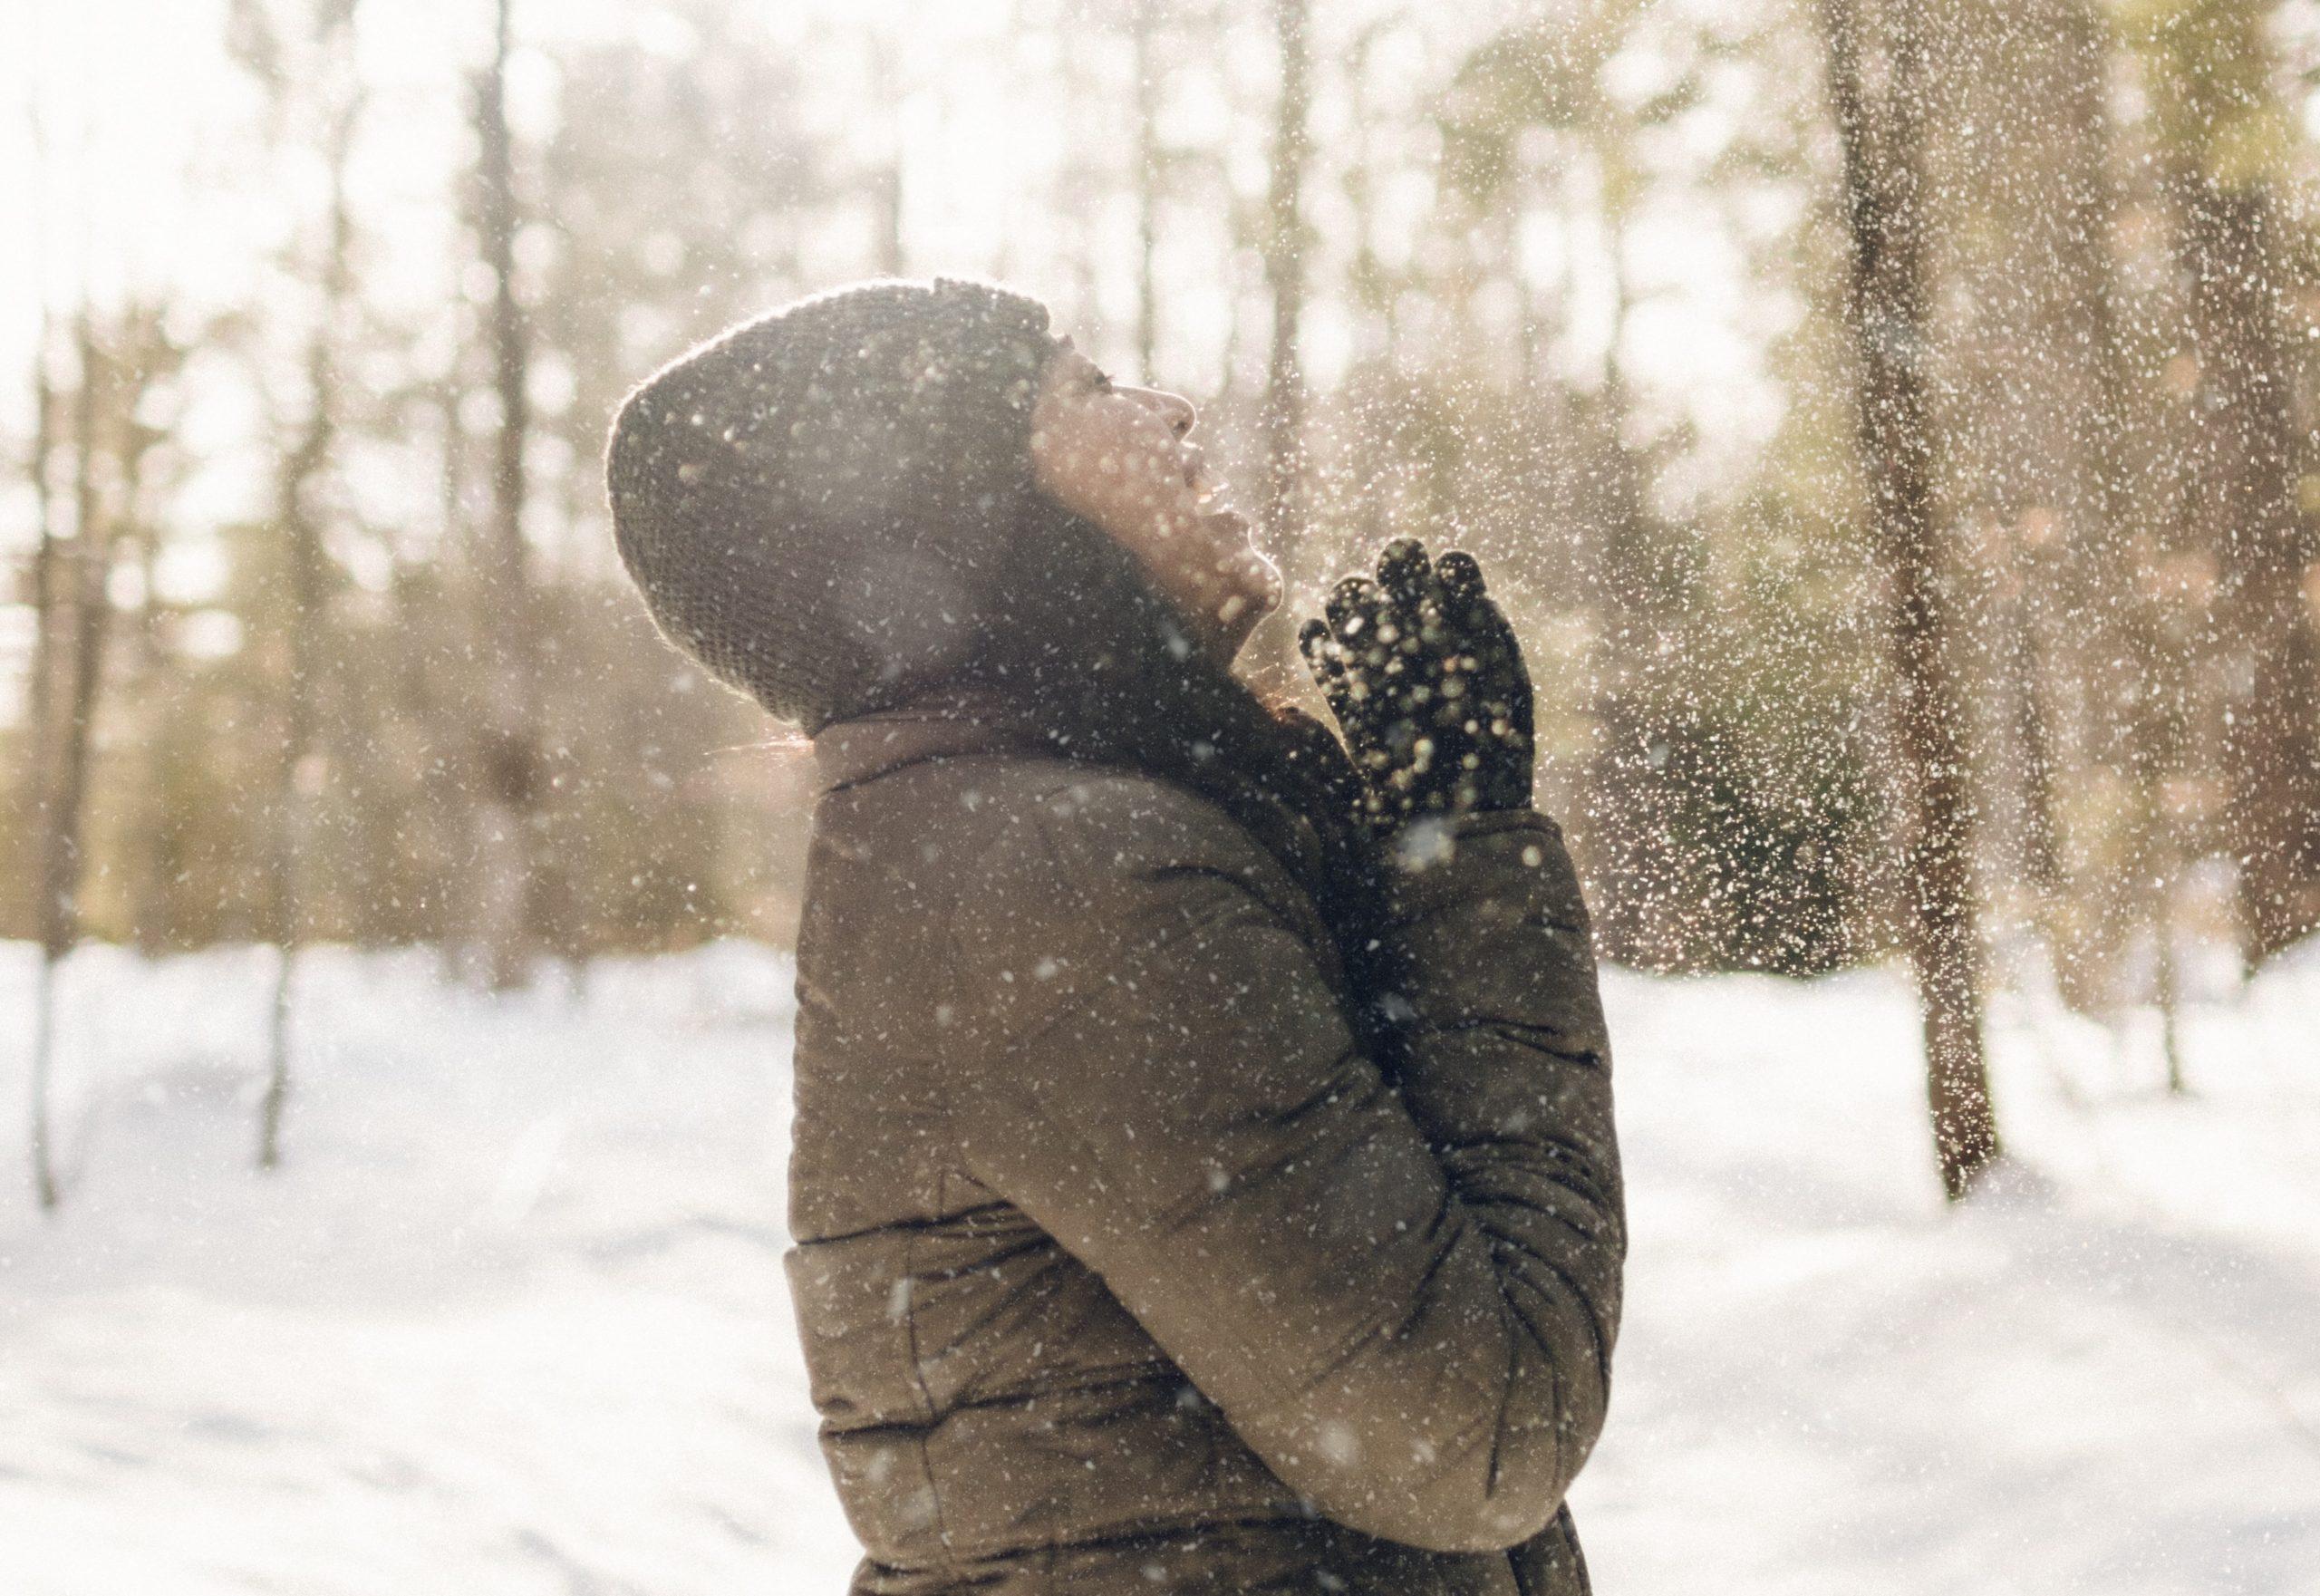 Creative Winter Photoshoot Ideas for Instagram